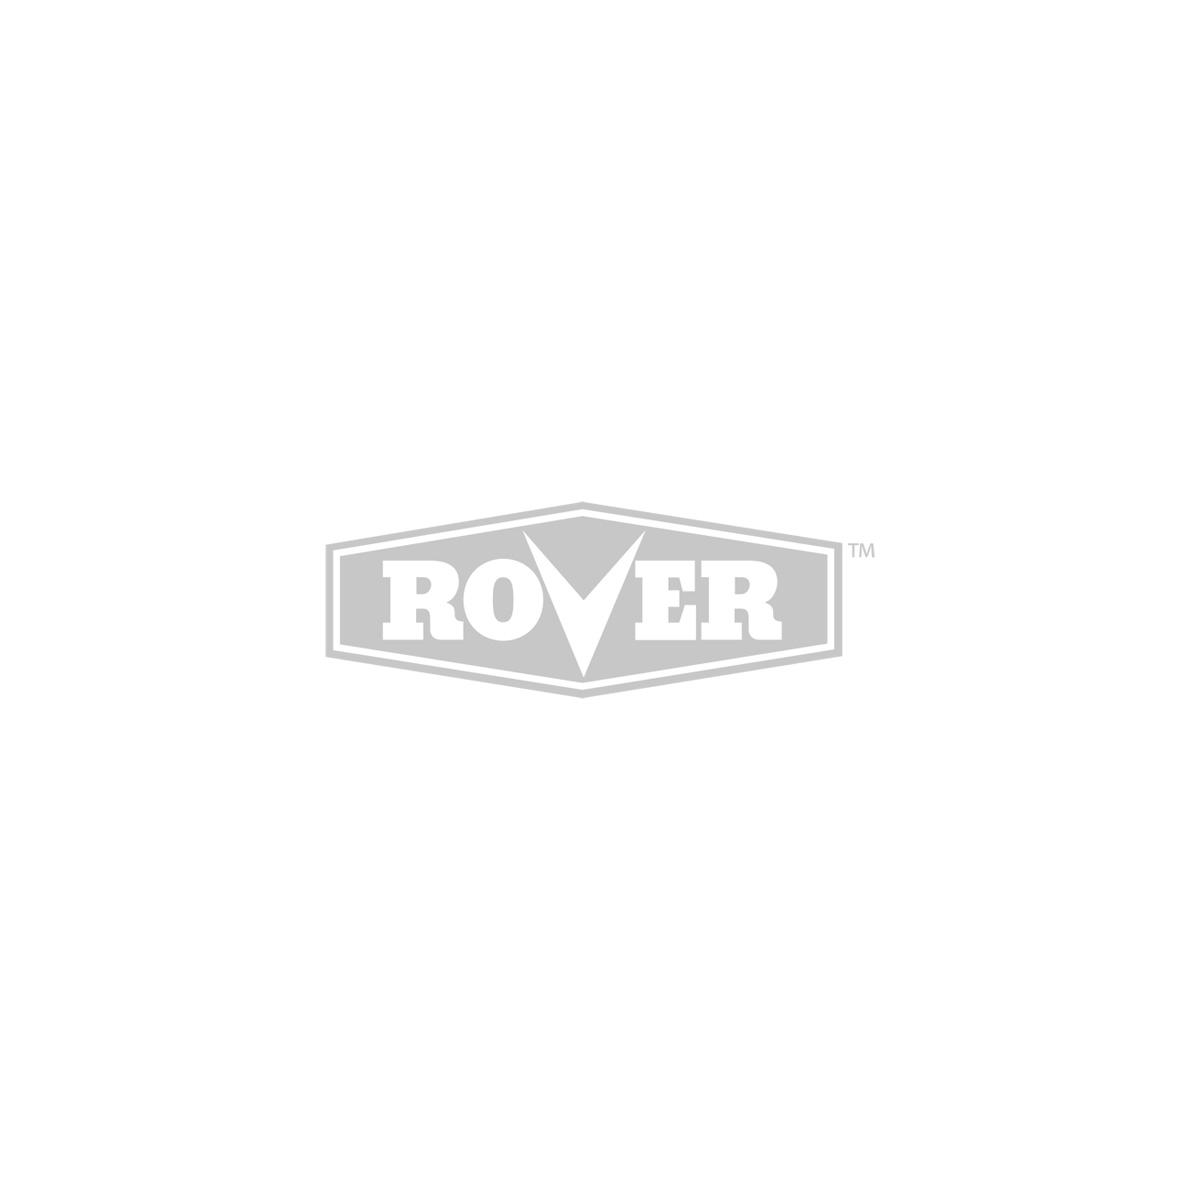 Ergonomic control panel with brush guard